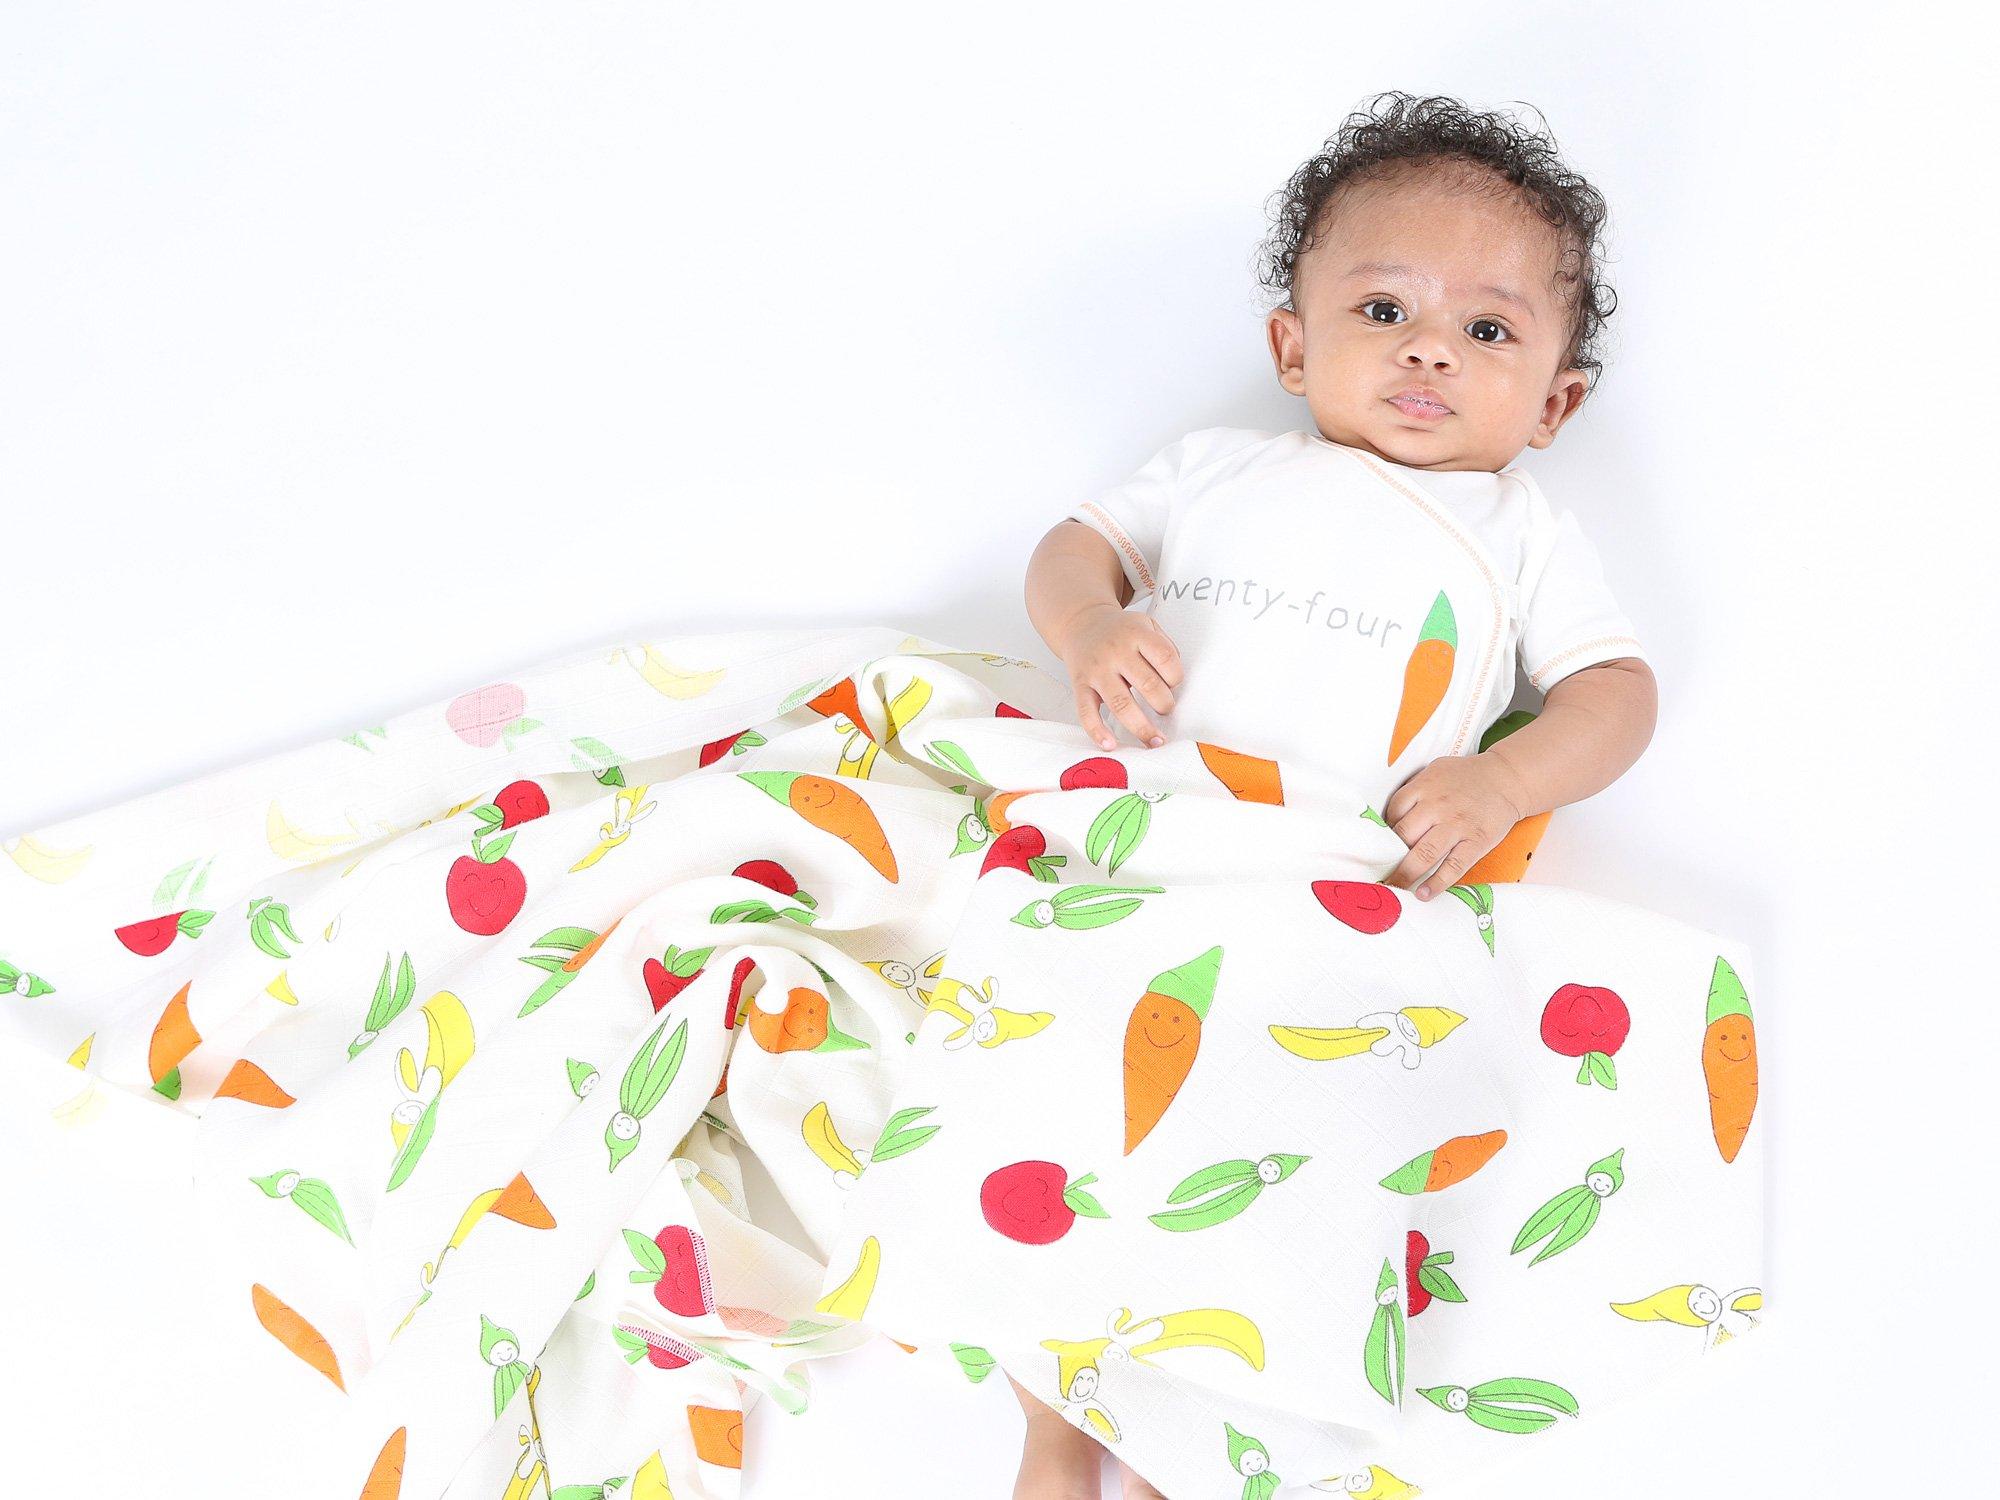 i20-1448-life-organic-muslin-baby-swaddle-blanket-fruit-veggie-print.jpg